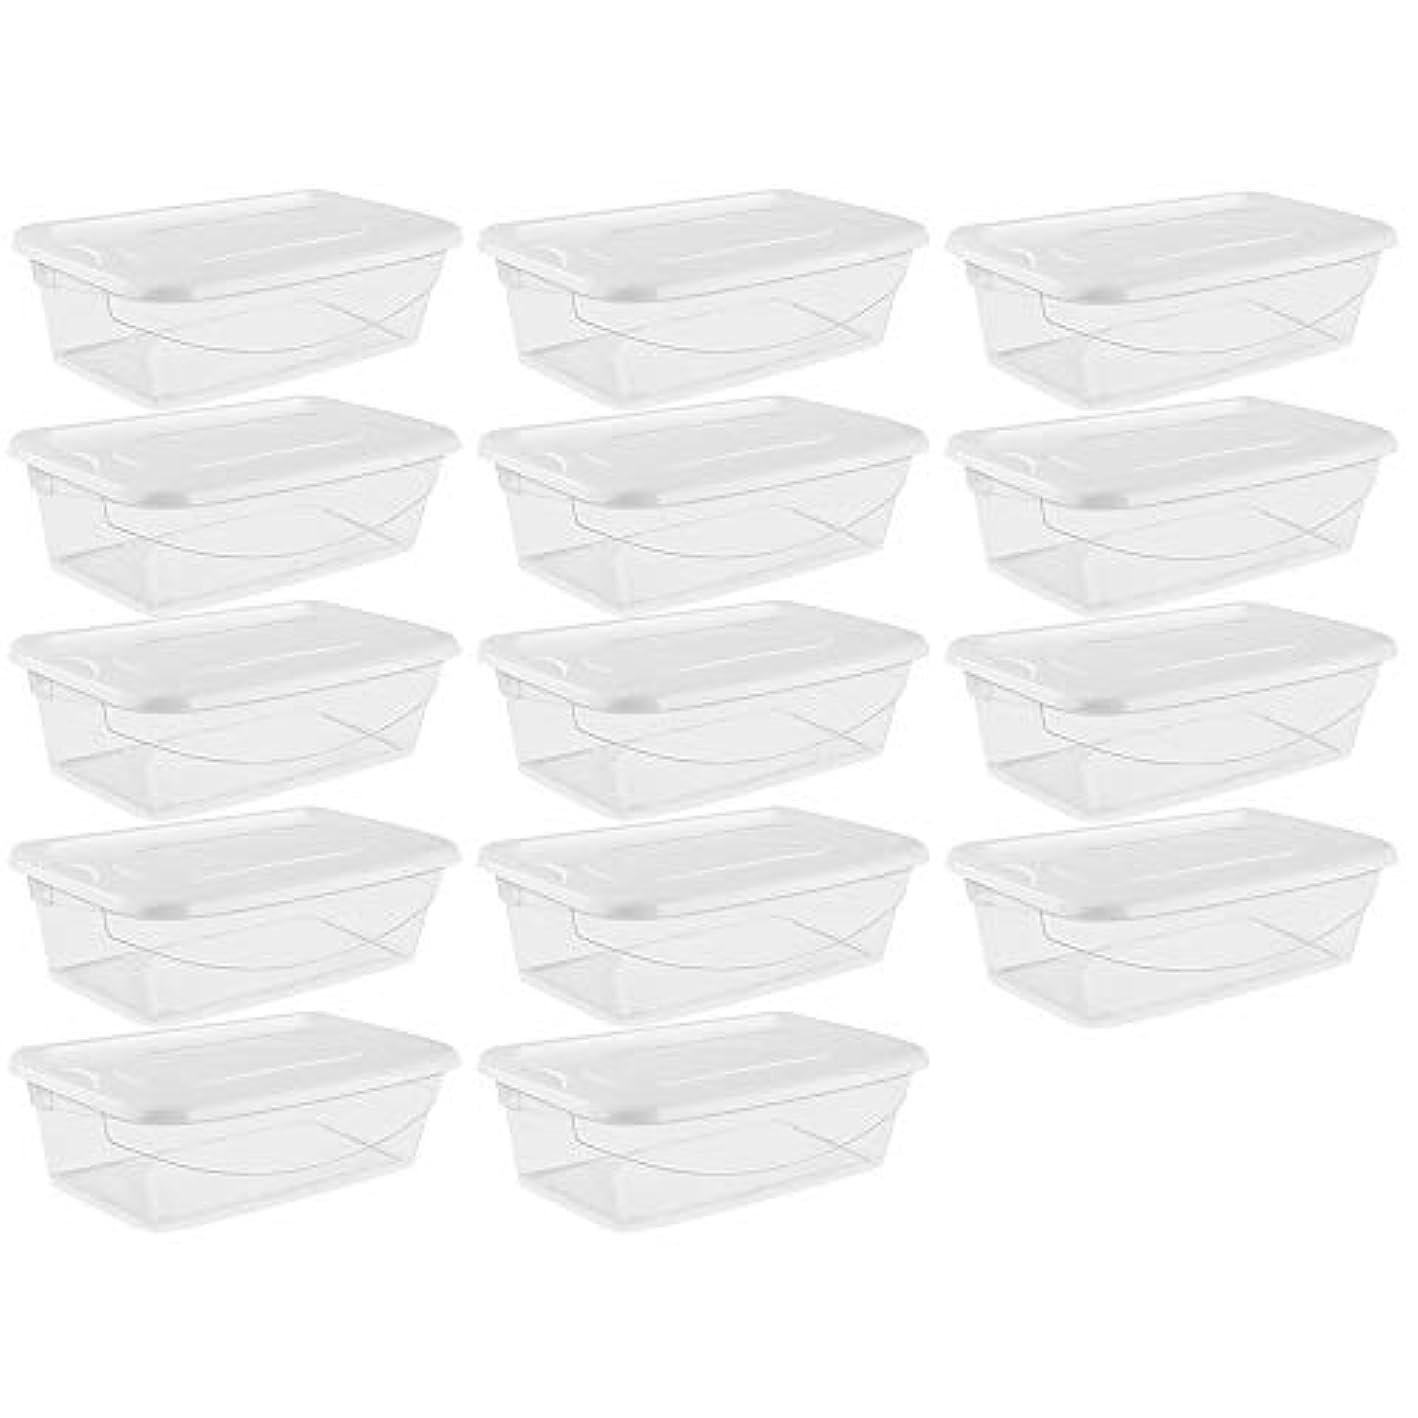 Shiny-GoGo Plastic Storage Box Shoe Box 6 Quart/5.7 Liter, Buckle White Lids, Clear Base(Pack of 14)